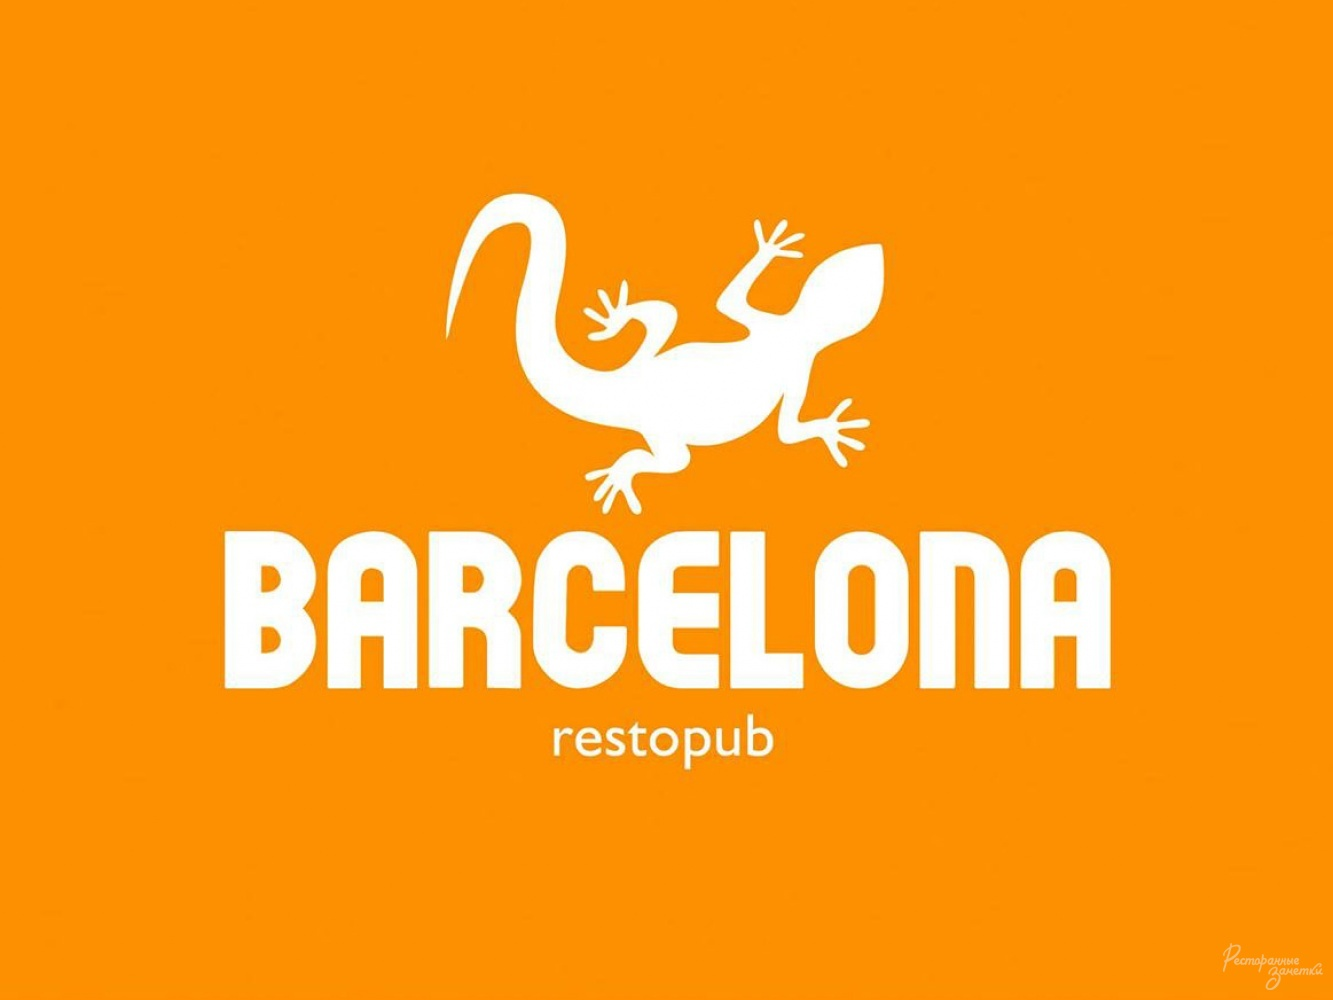 restopub Barcelona Restopub, Харьков